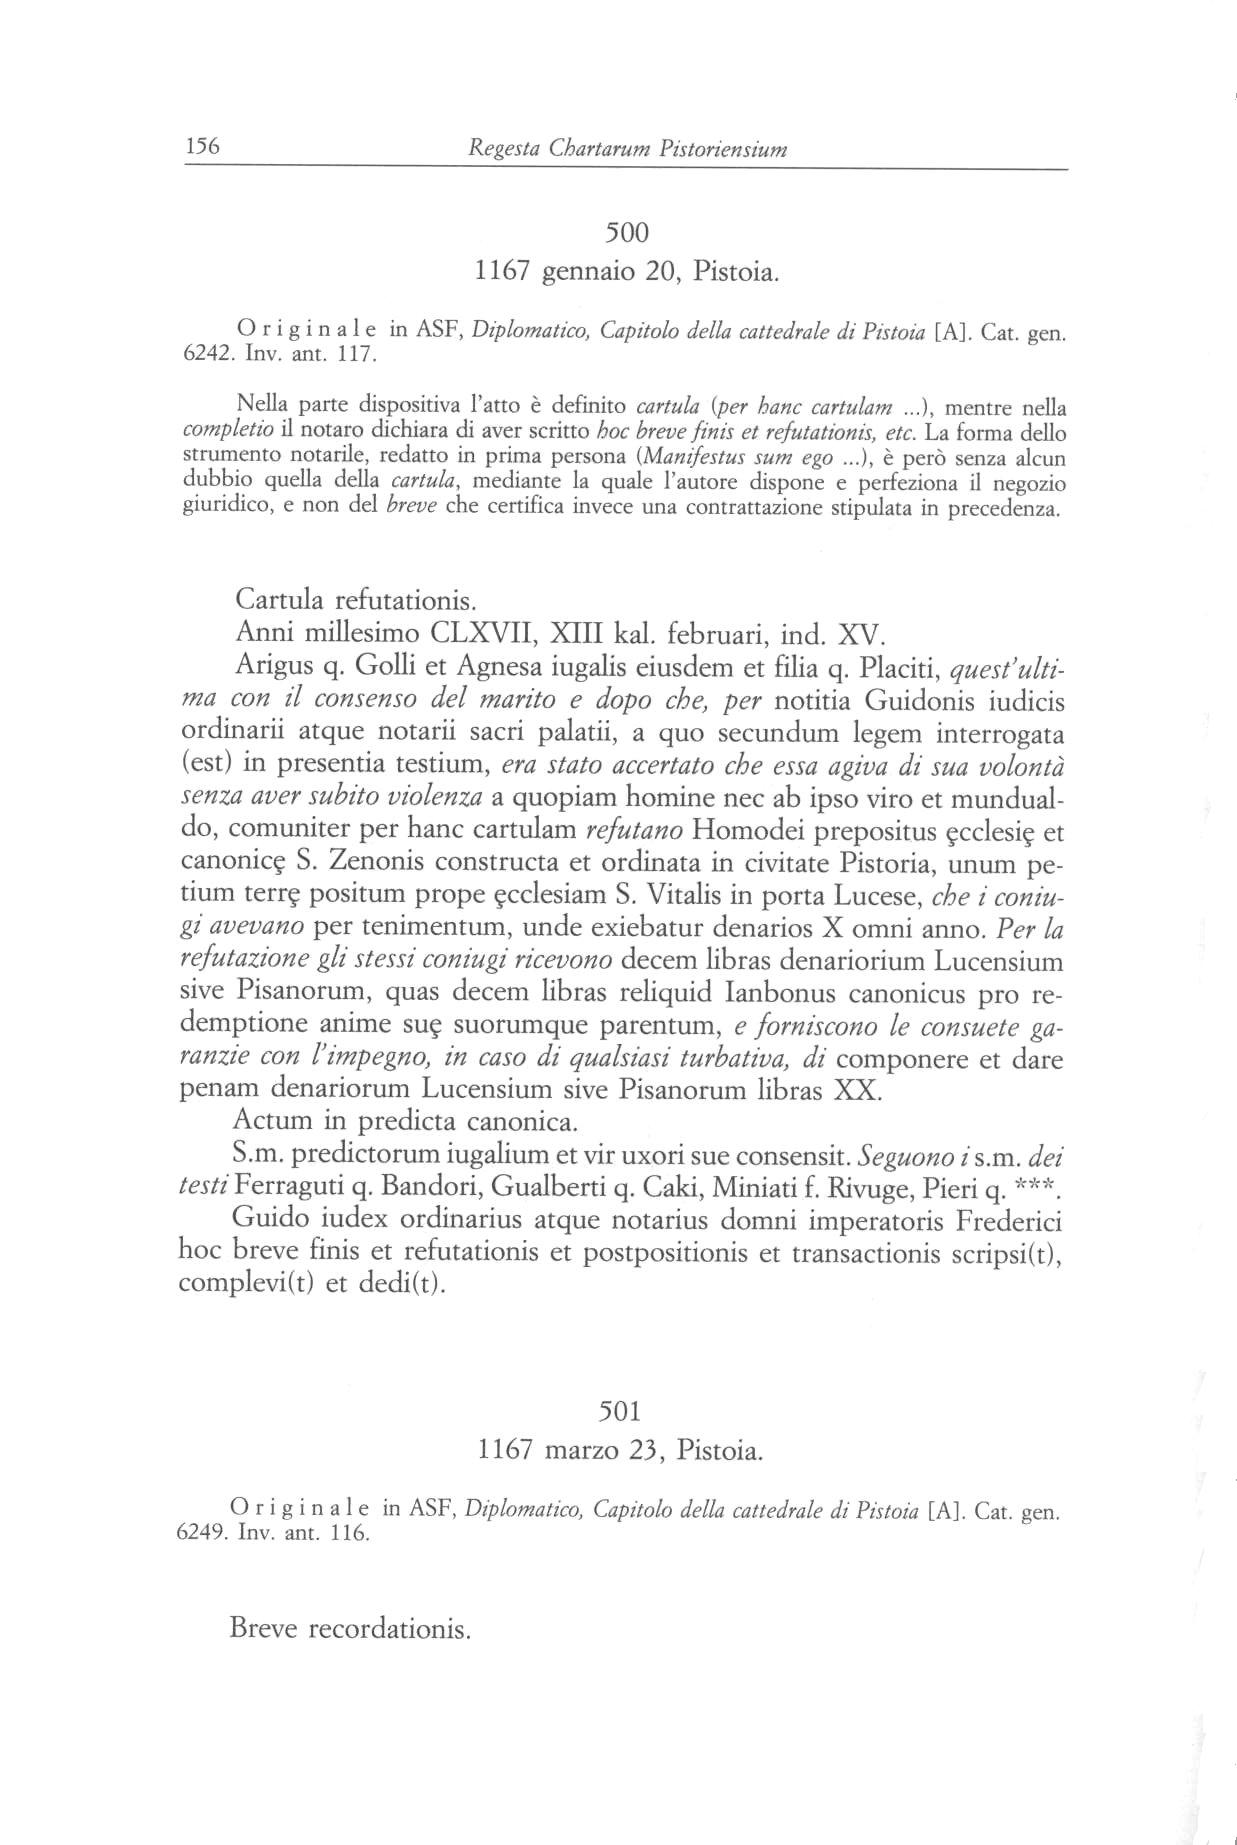 Canonica S. Zenone XII 0156.jpg